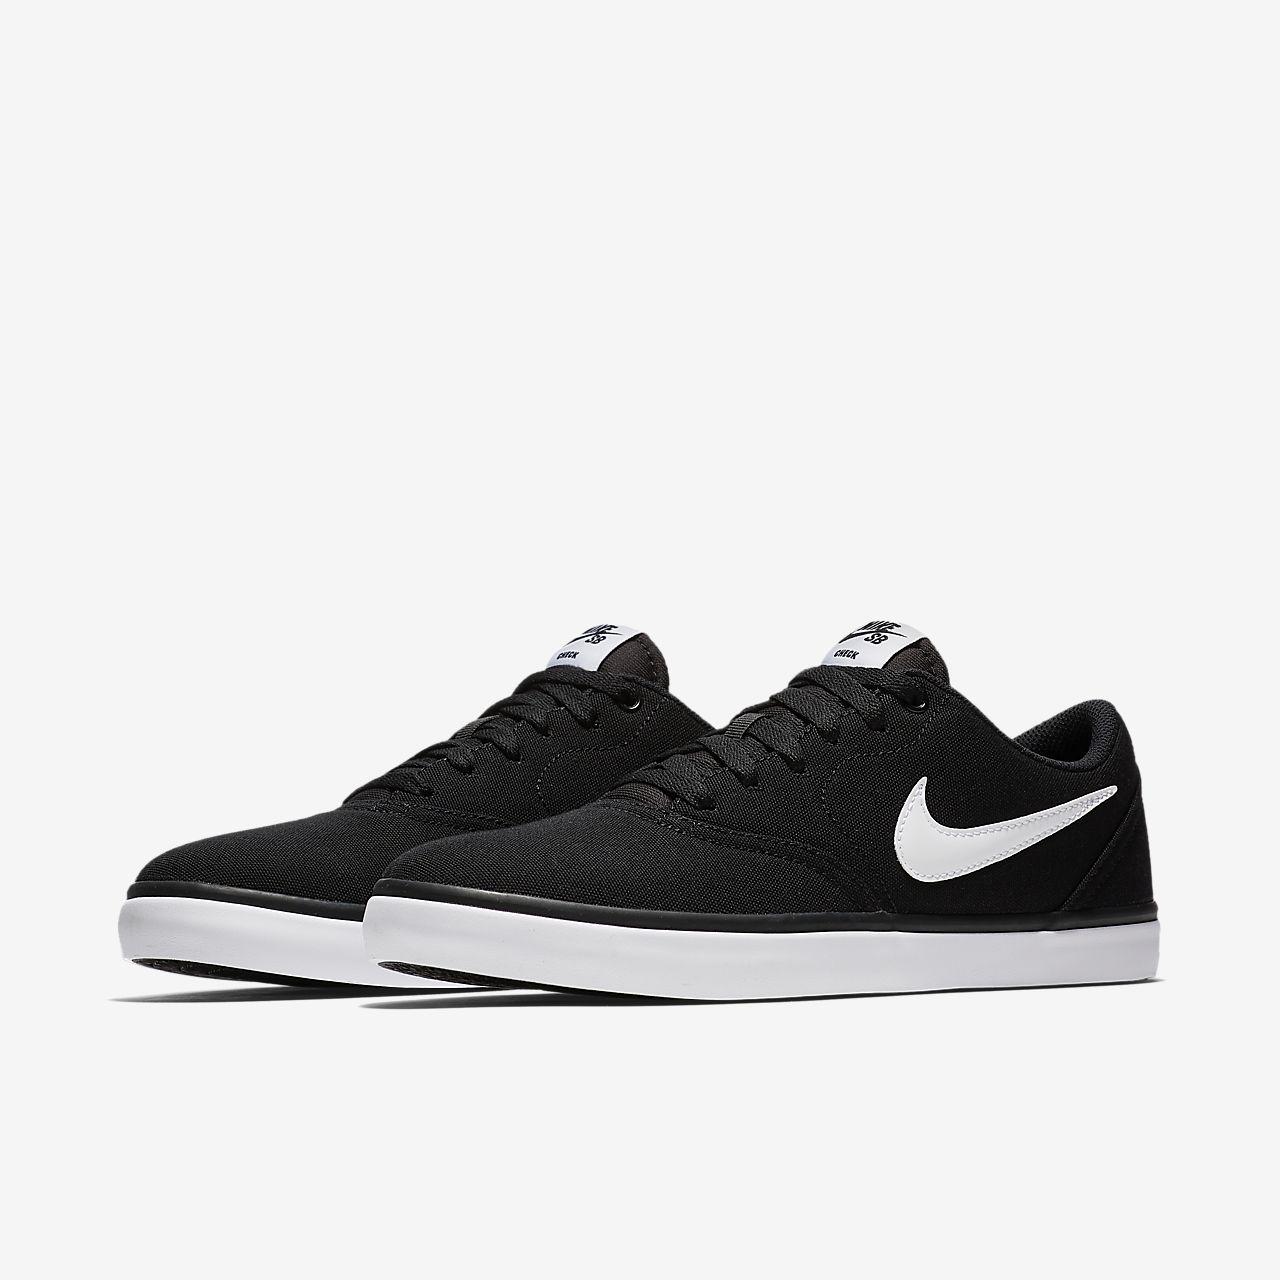 ... Nike SB Check Solarsoft Canvas Men's Skateboarding Shoe